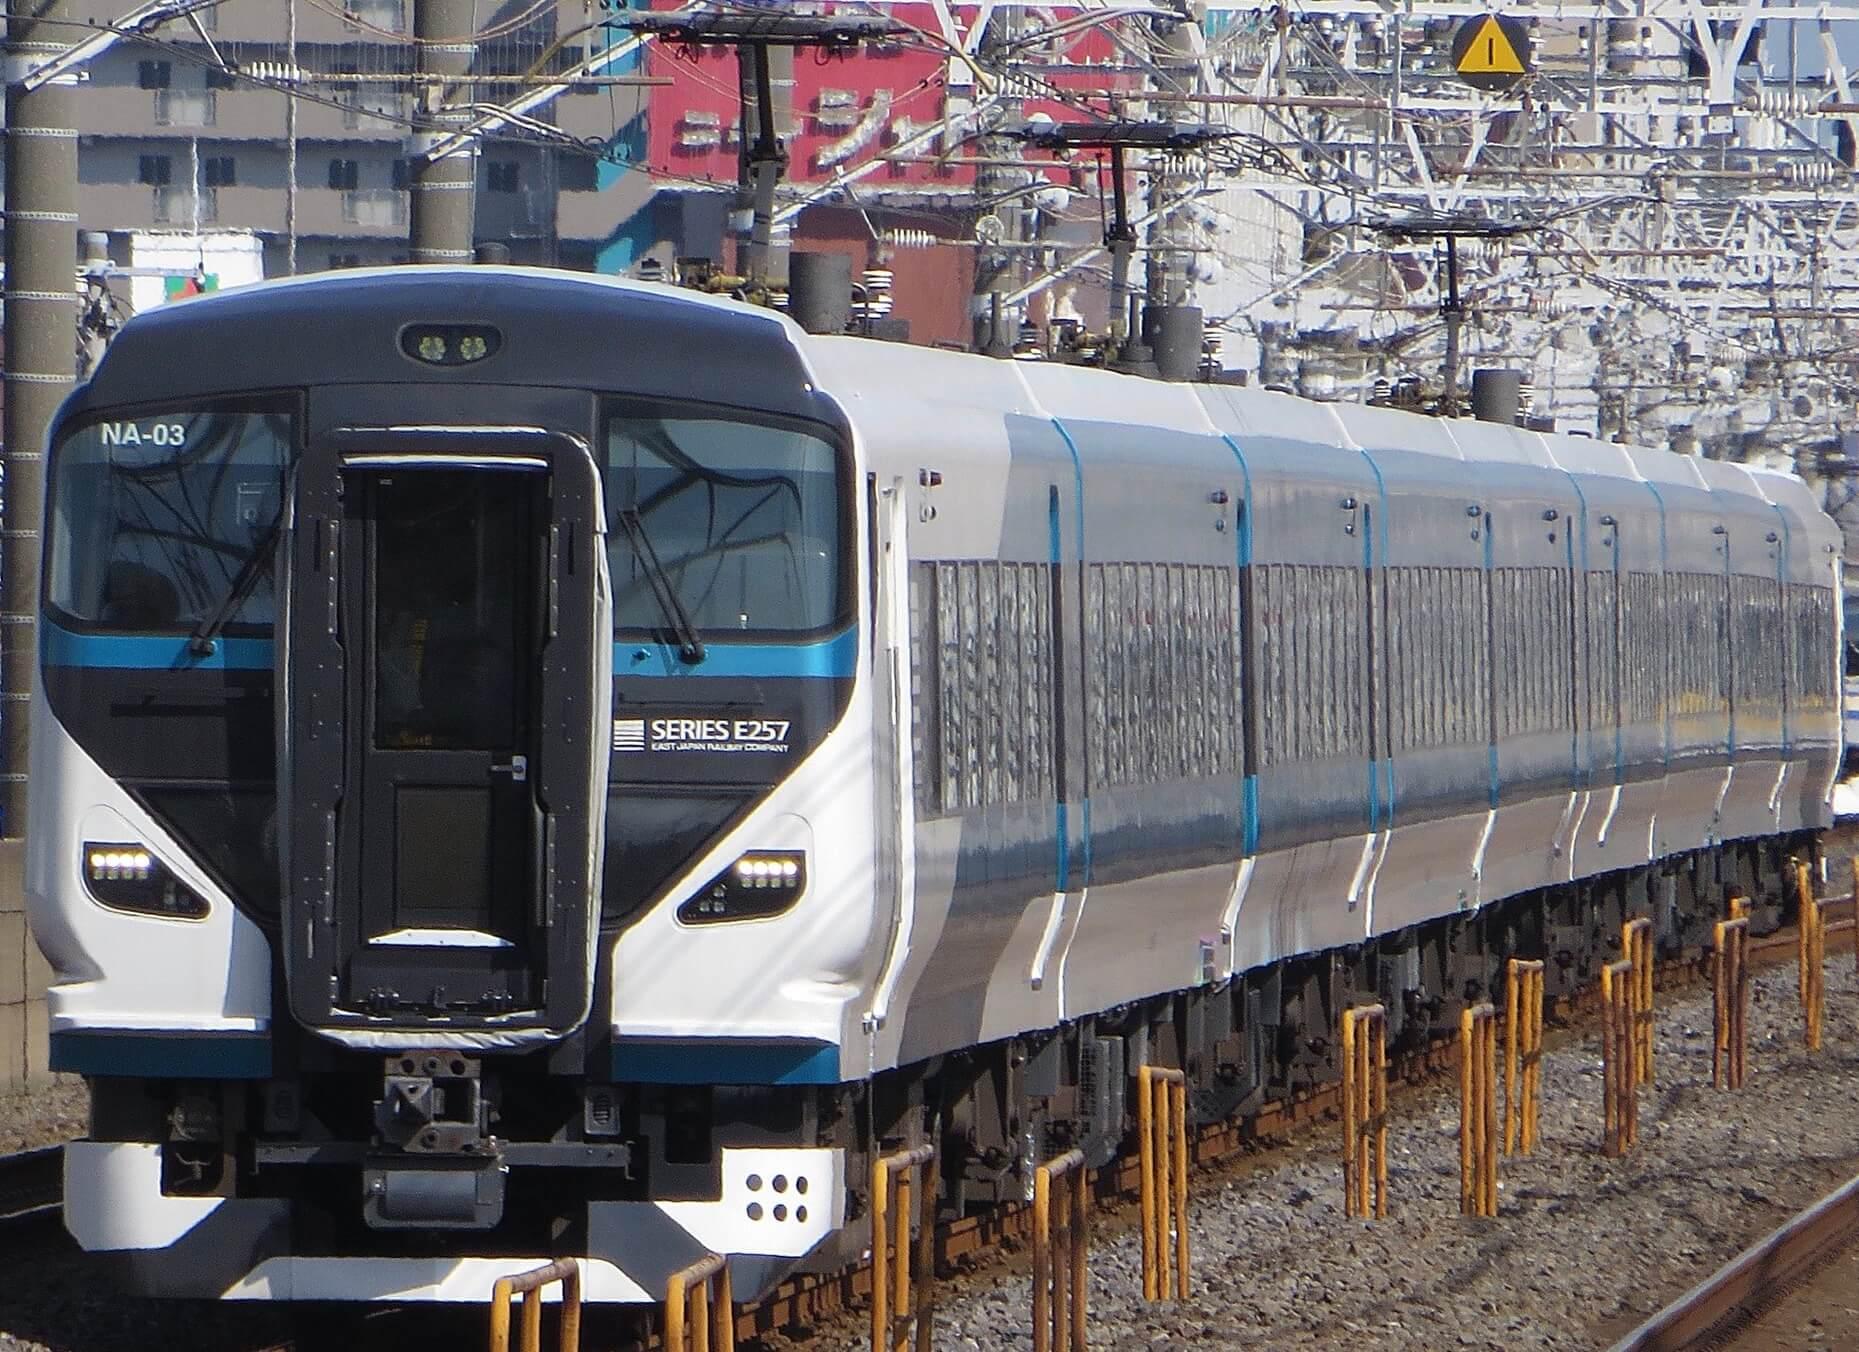 JR East E257 2000 Series Test Run - 2020春ダイヤ改正、伊豆特急大幅リニューアル